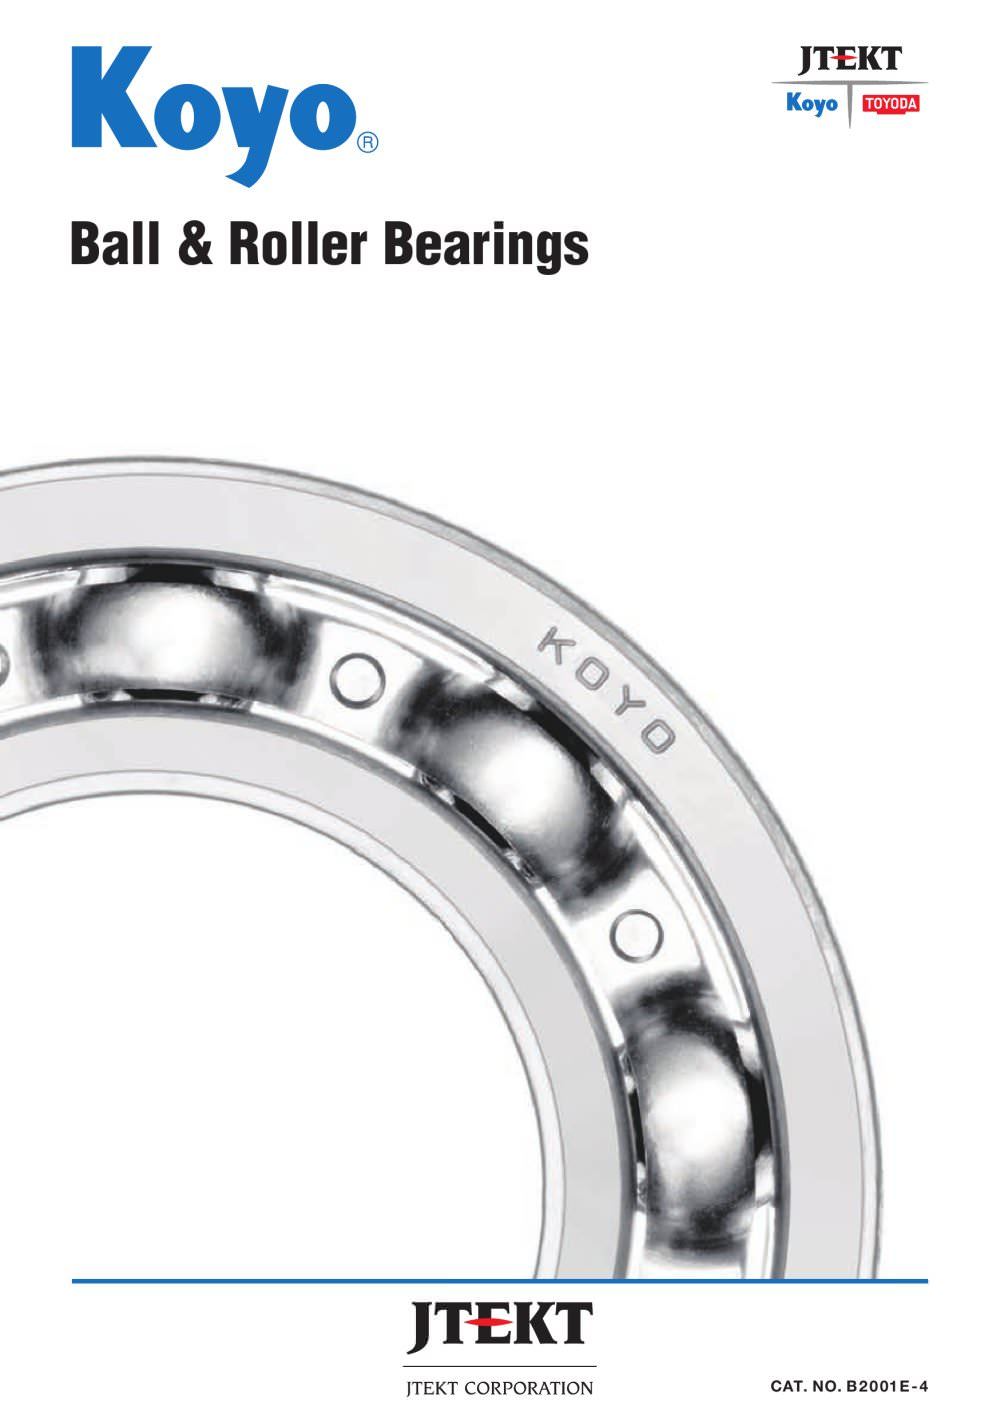 Ball Roller Bearings Jtekt Koyo Pdf Catalogs Technical